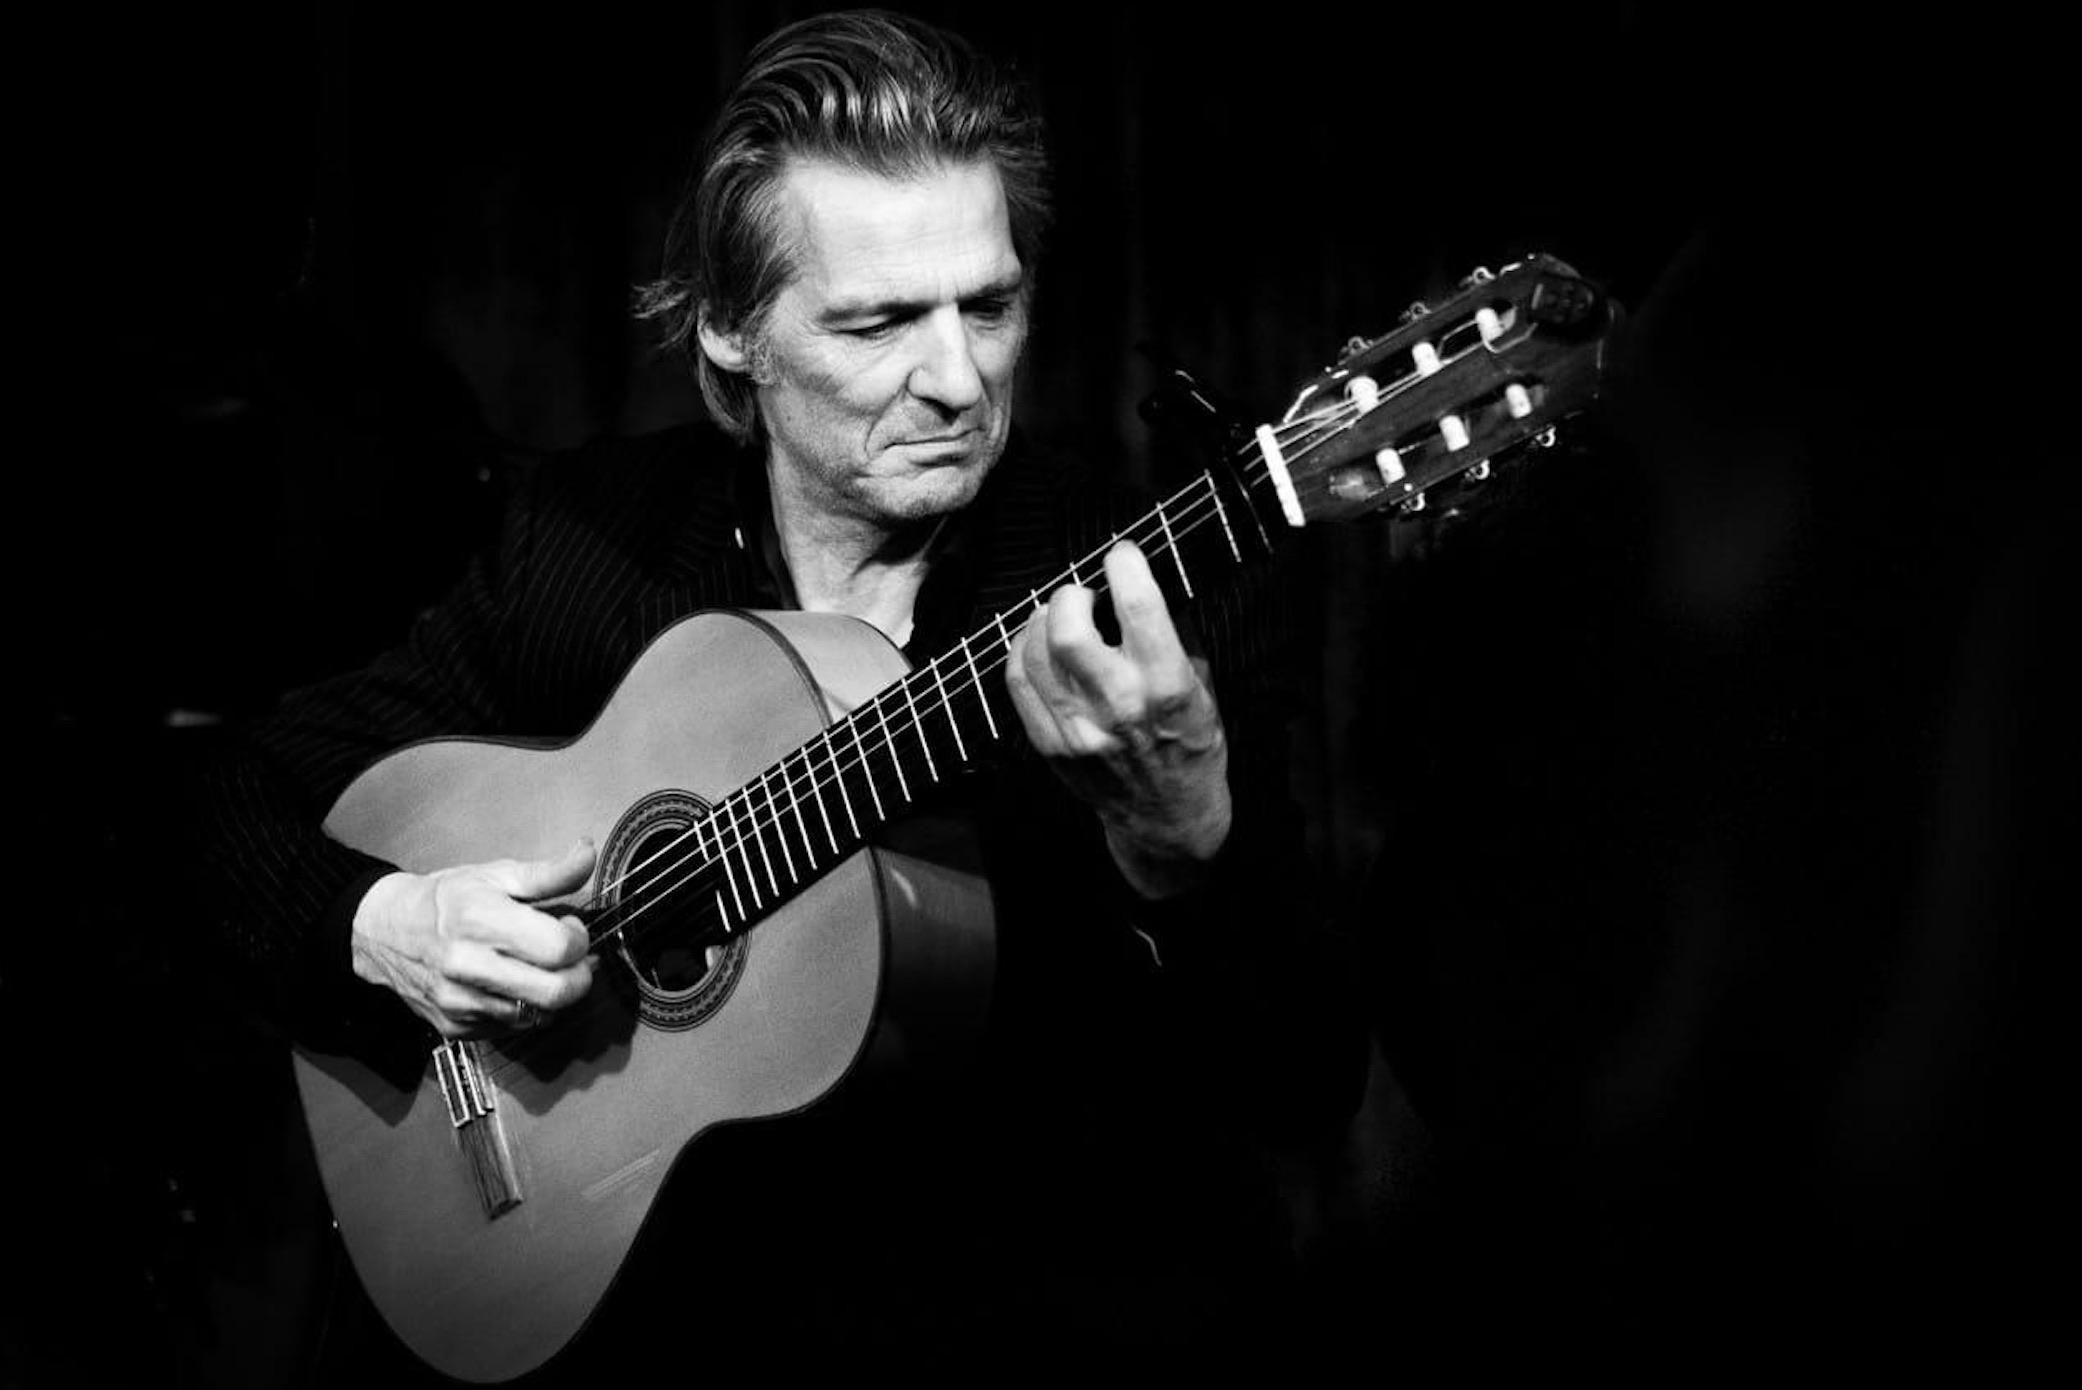 Yvan le Bolloc'h - Yvan le Bolloc'h et ma guitare